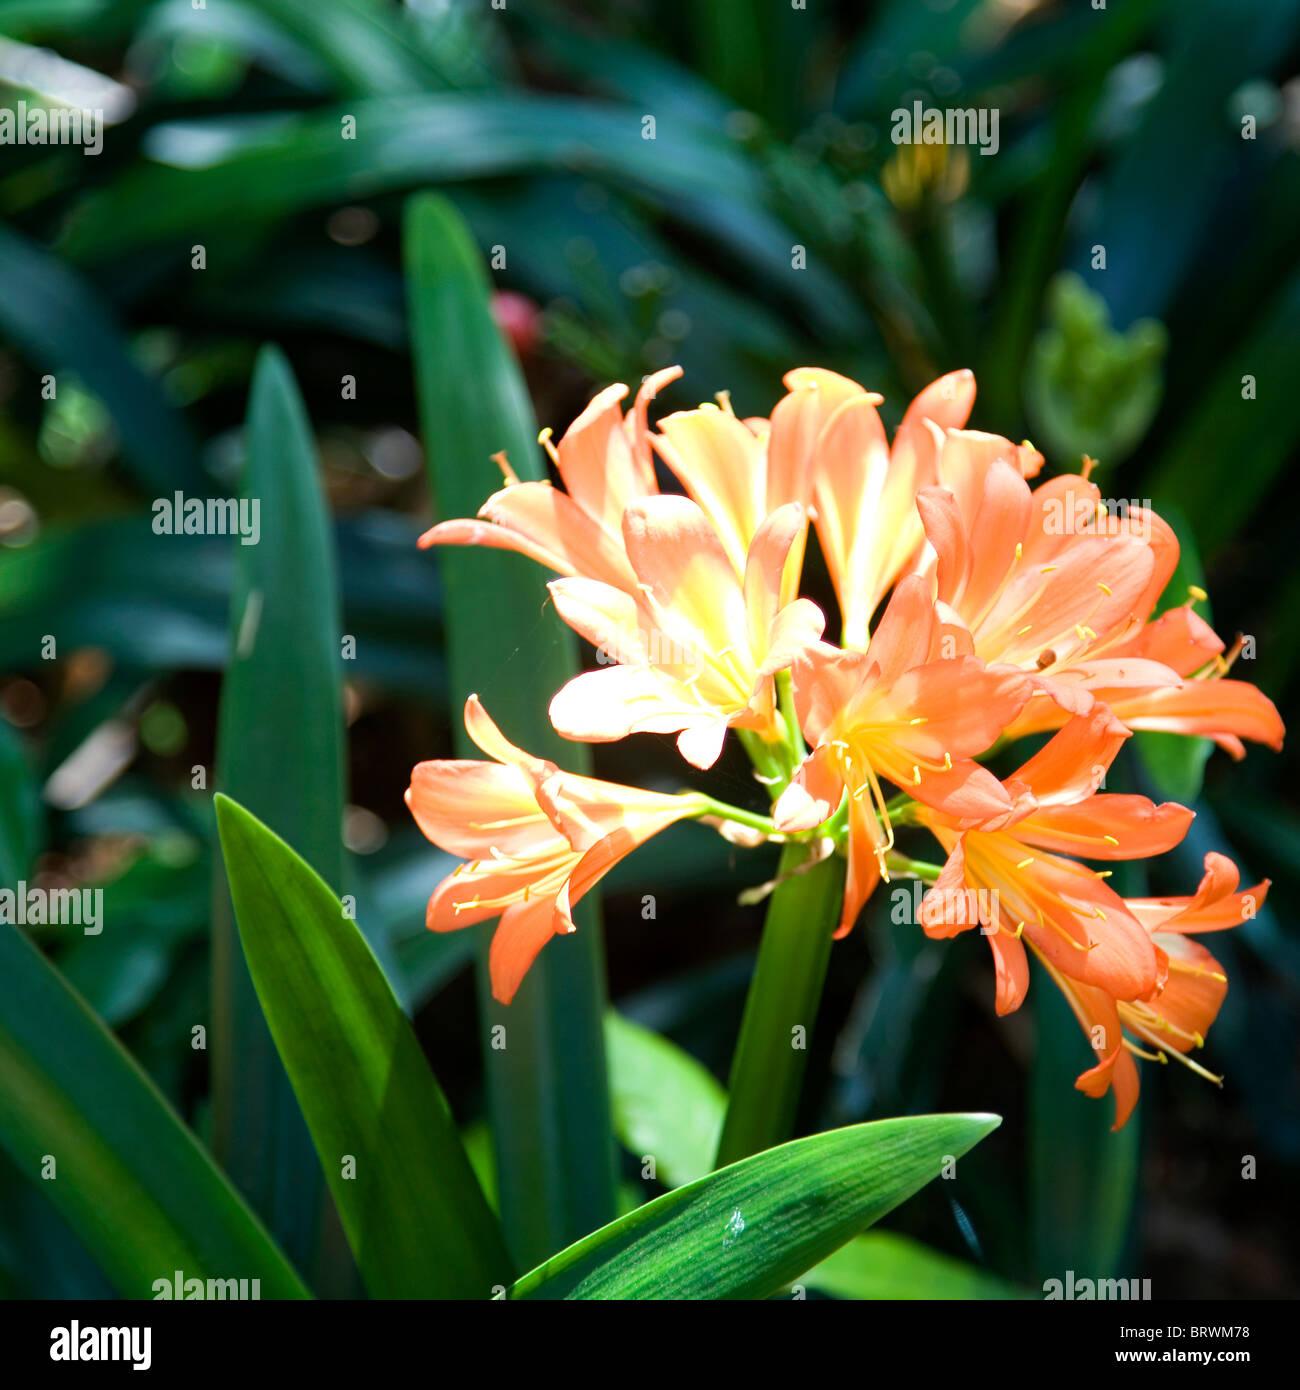 Agapanthus Orange Flowers